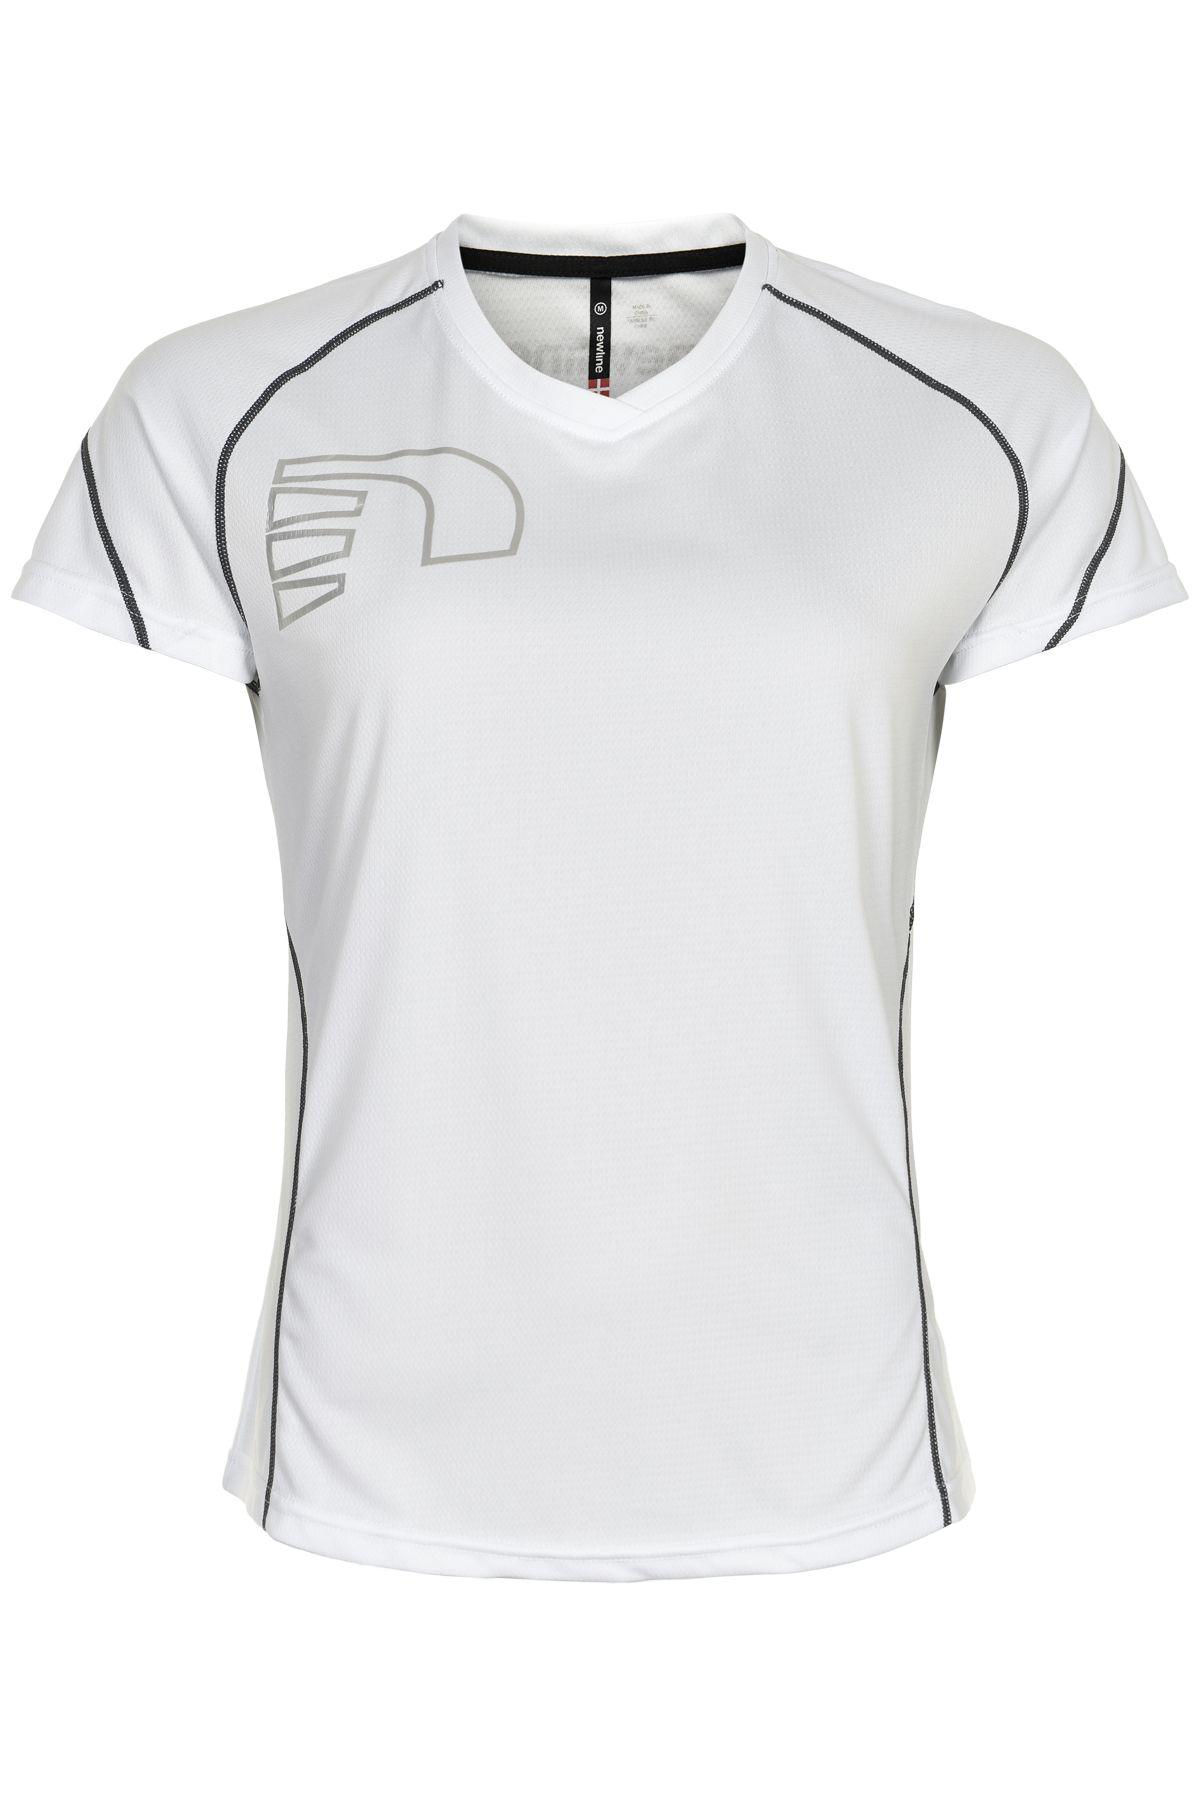 Newline W Core Coolskin t-shirt